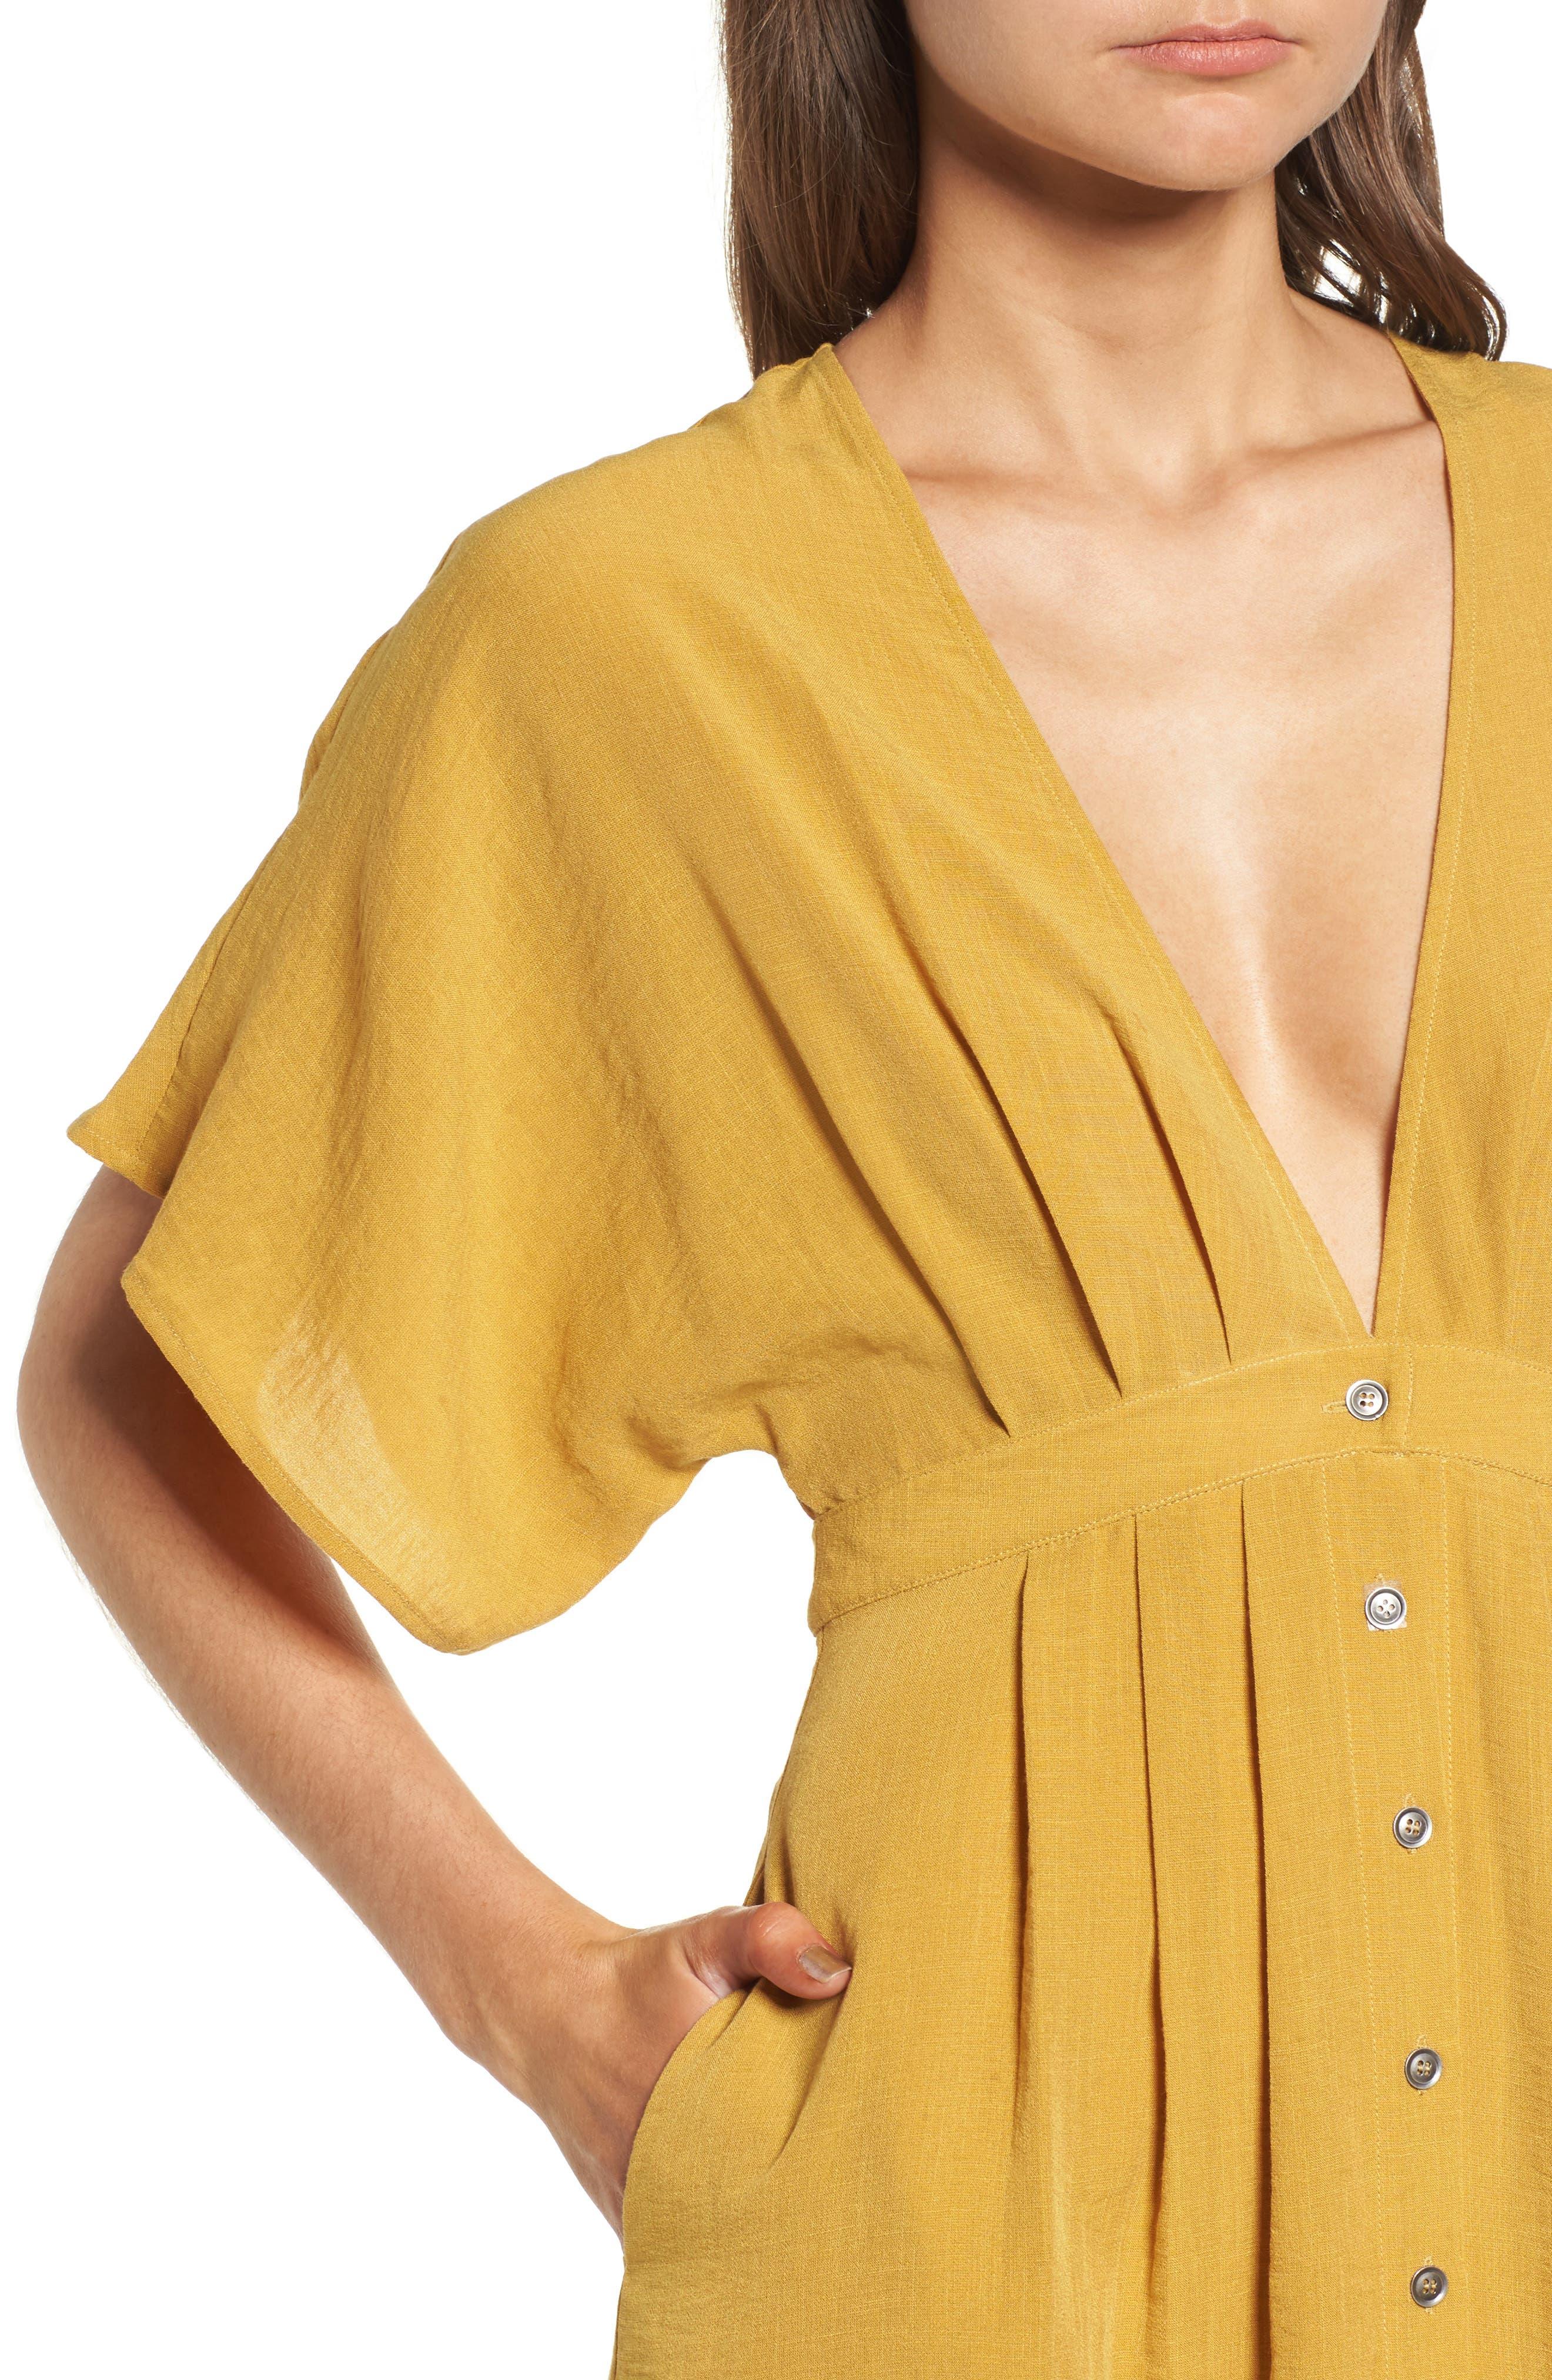 Poppy Button Front Midi Dress,                             Alternate thumbnail 4, color,                             702